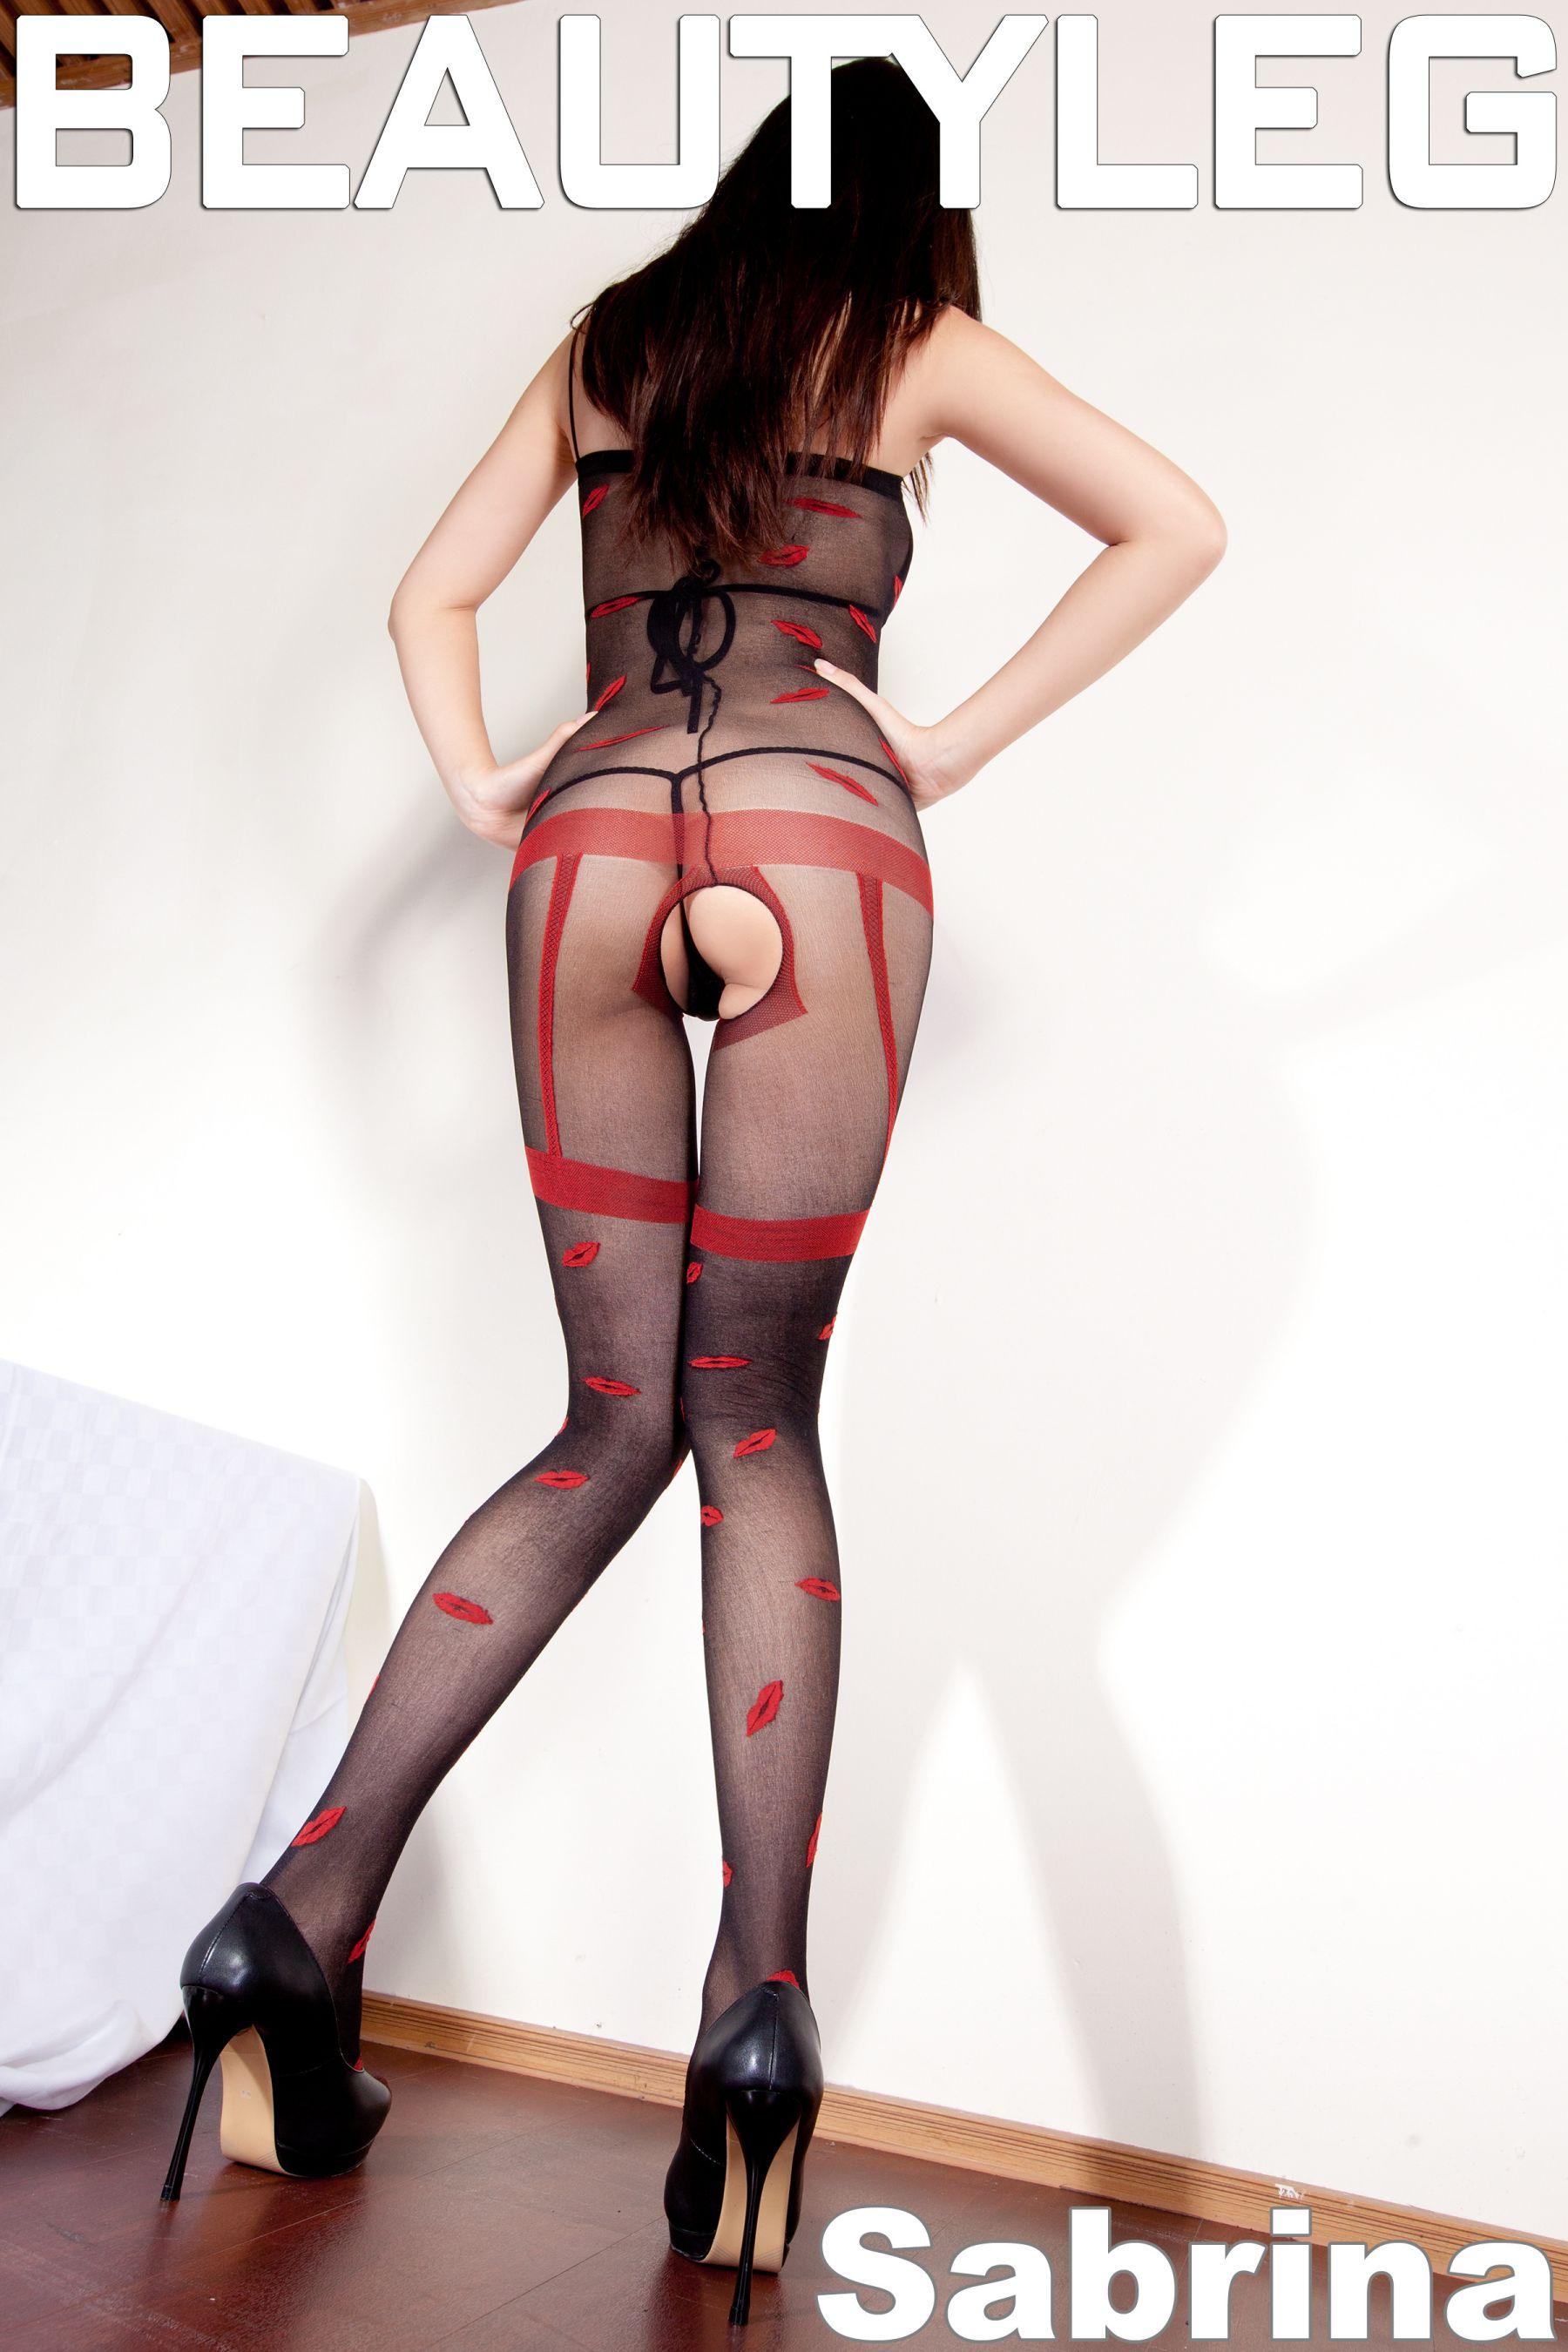 VOL.1017 [Beautyleg]美腿丁字裤情趣丝袜:腿模Sabrina高品质写真套图(54P)